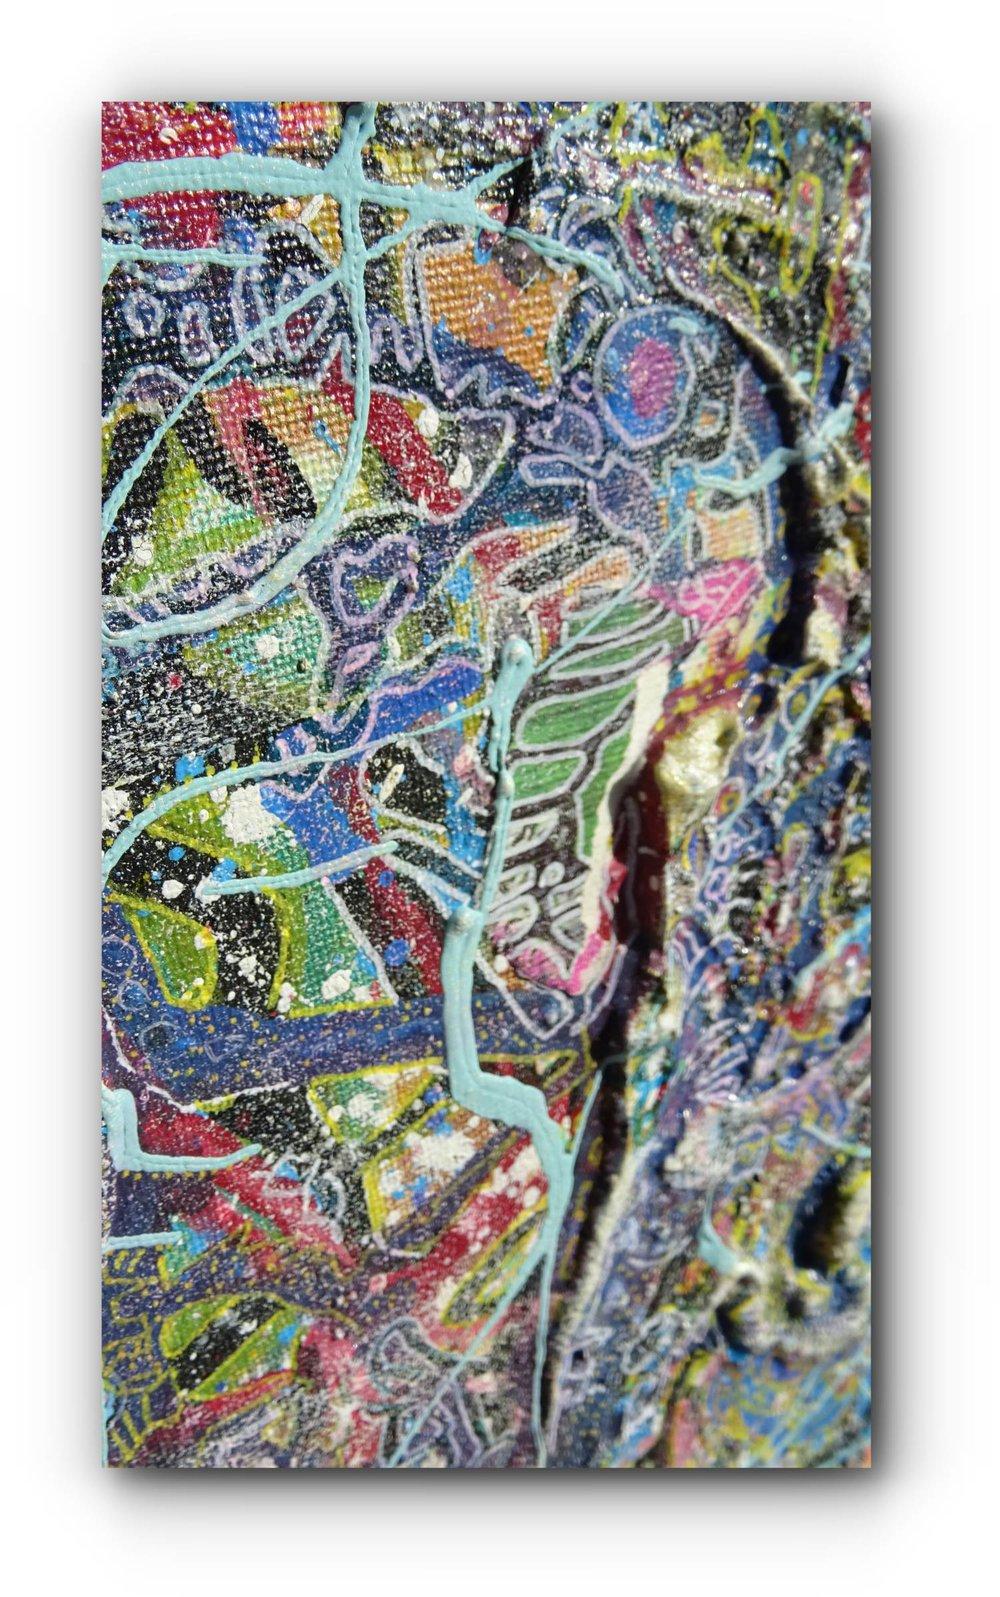 painting-detail-3-pillars-cosmos-artists-ingress-vortices.jpg